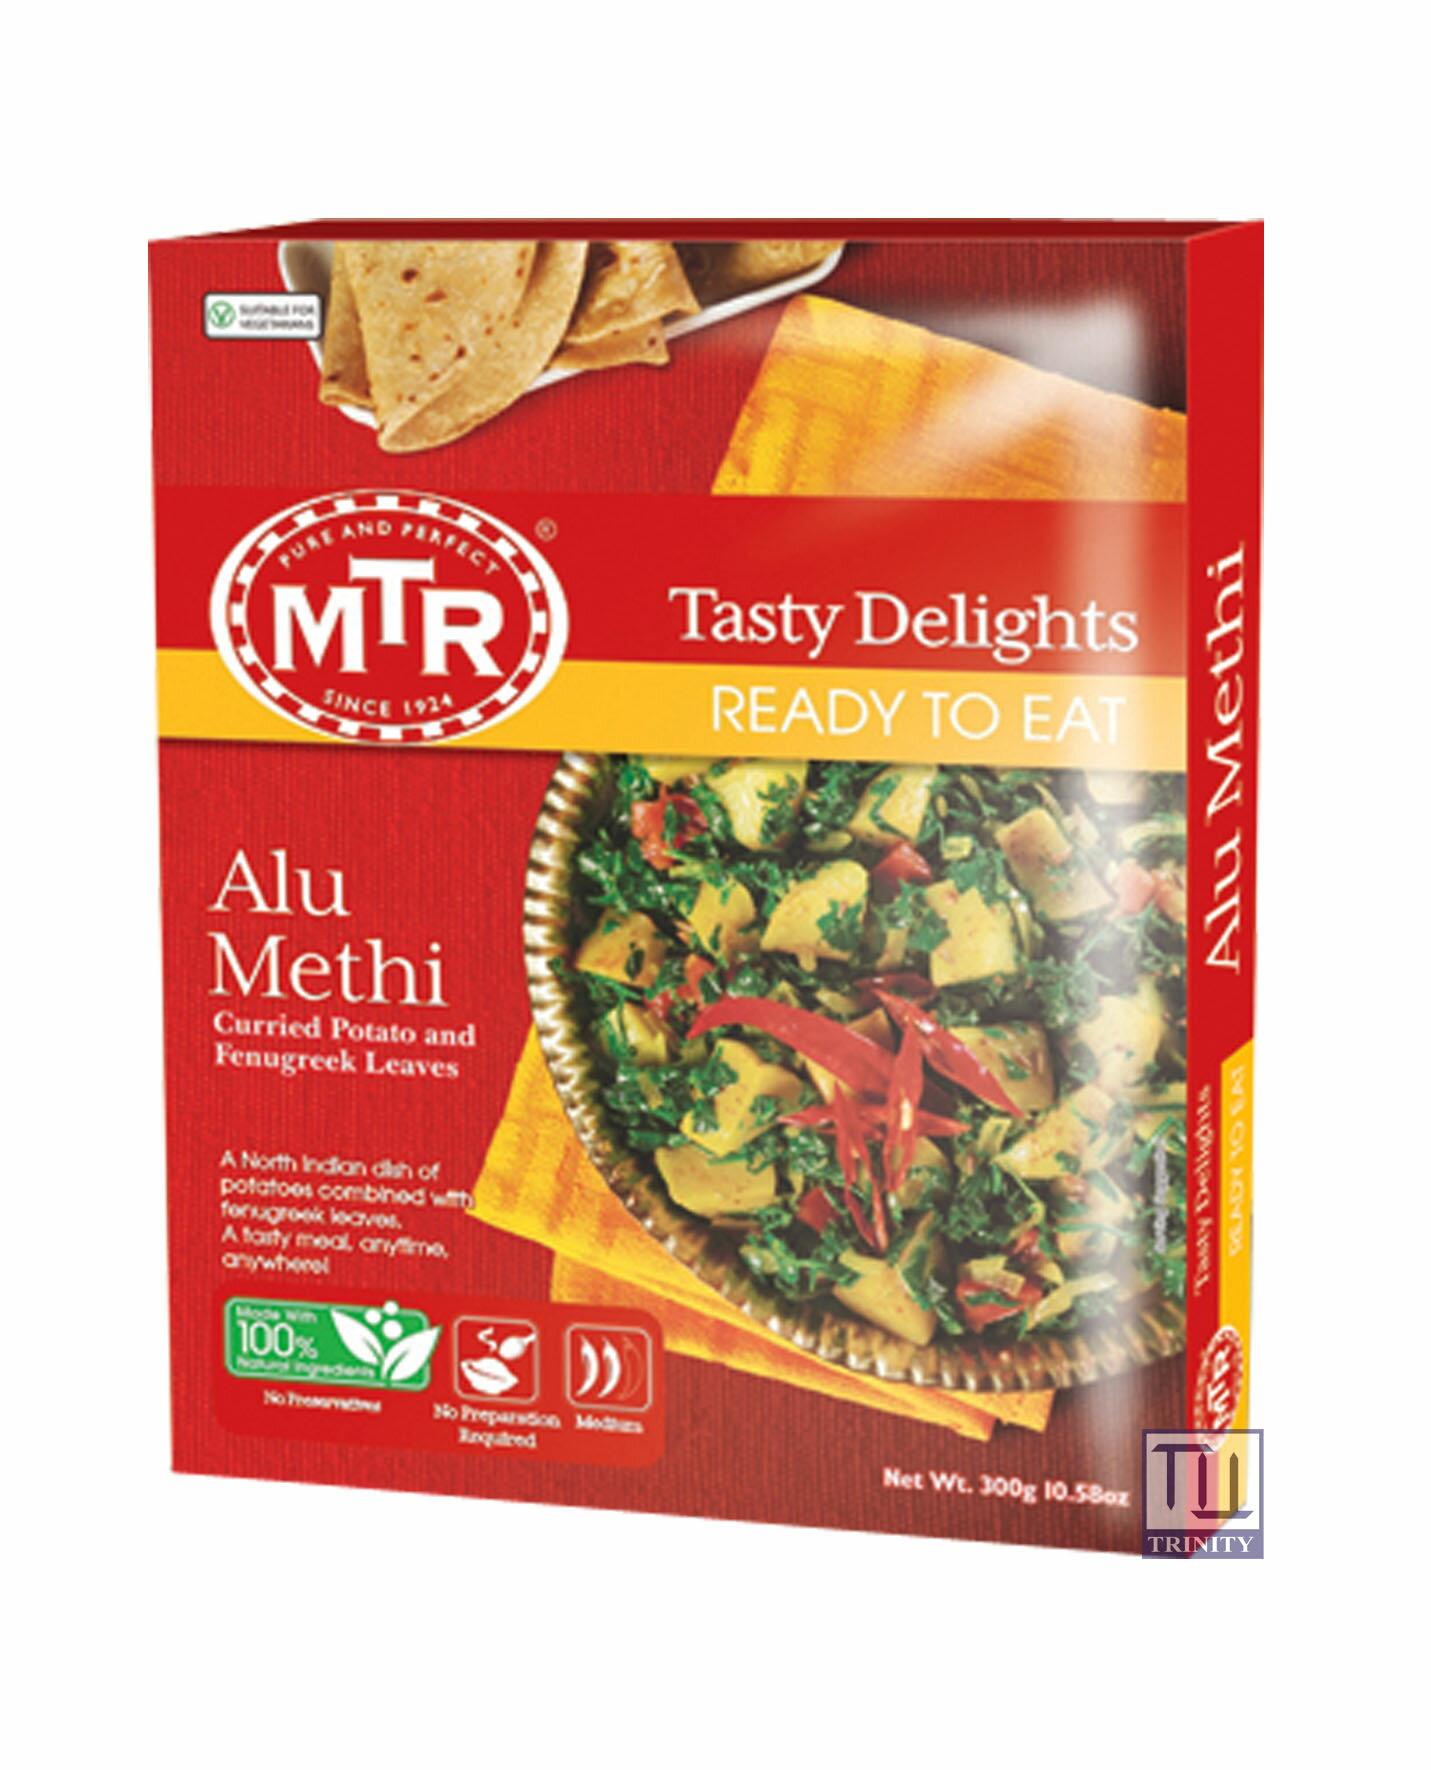 Mtr Alu Methi 印度馬鈴薯+葫蘆巴即食調理包